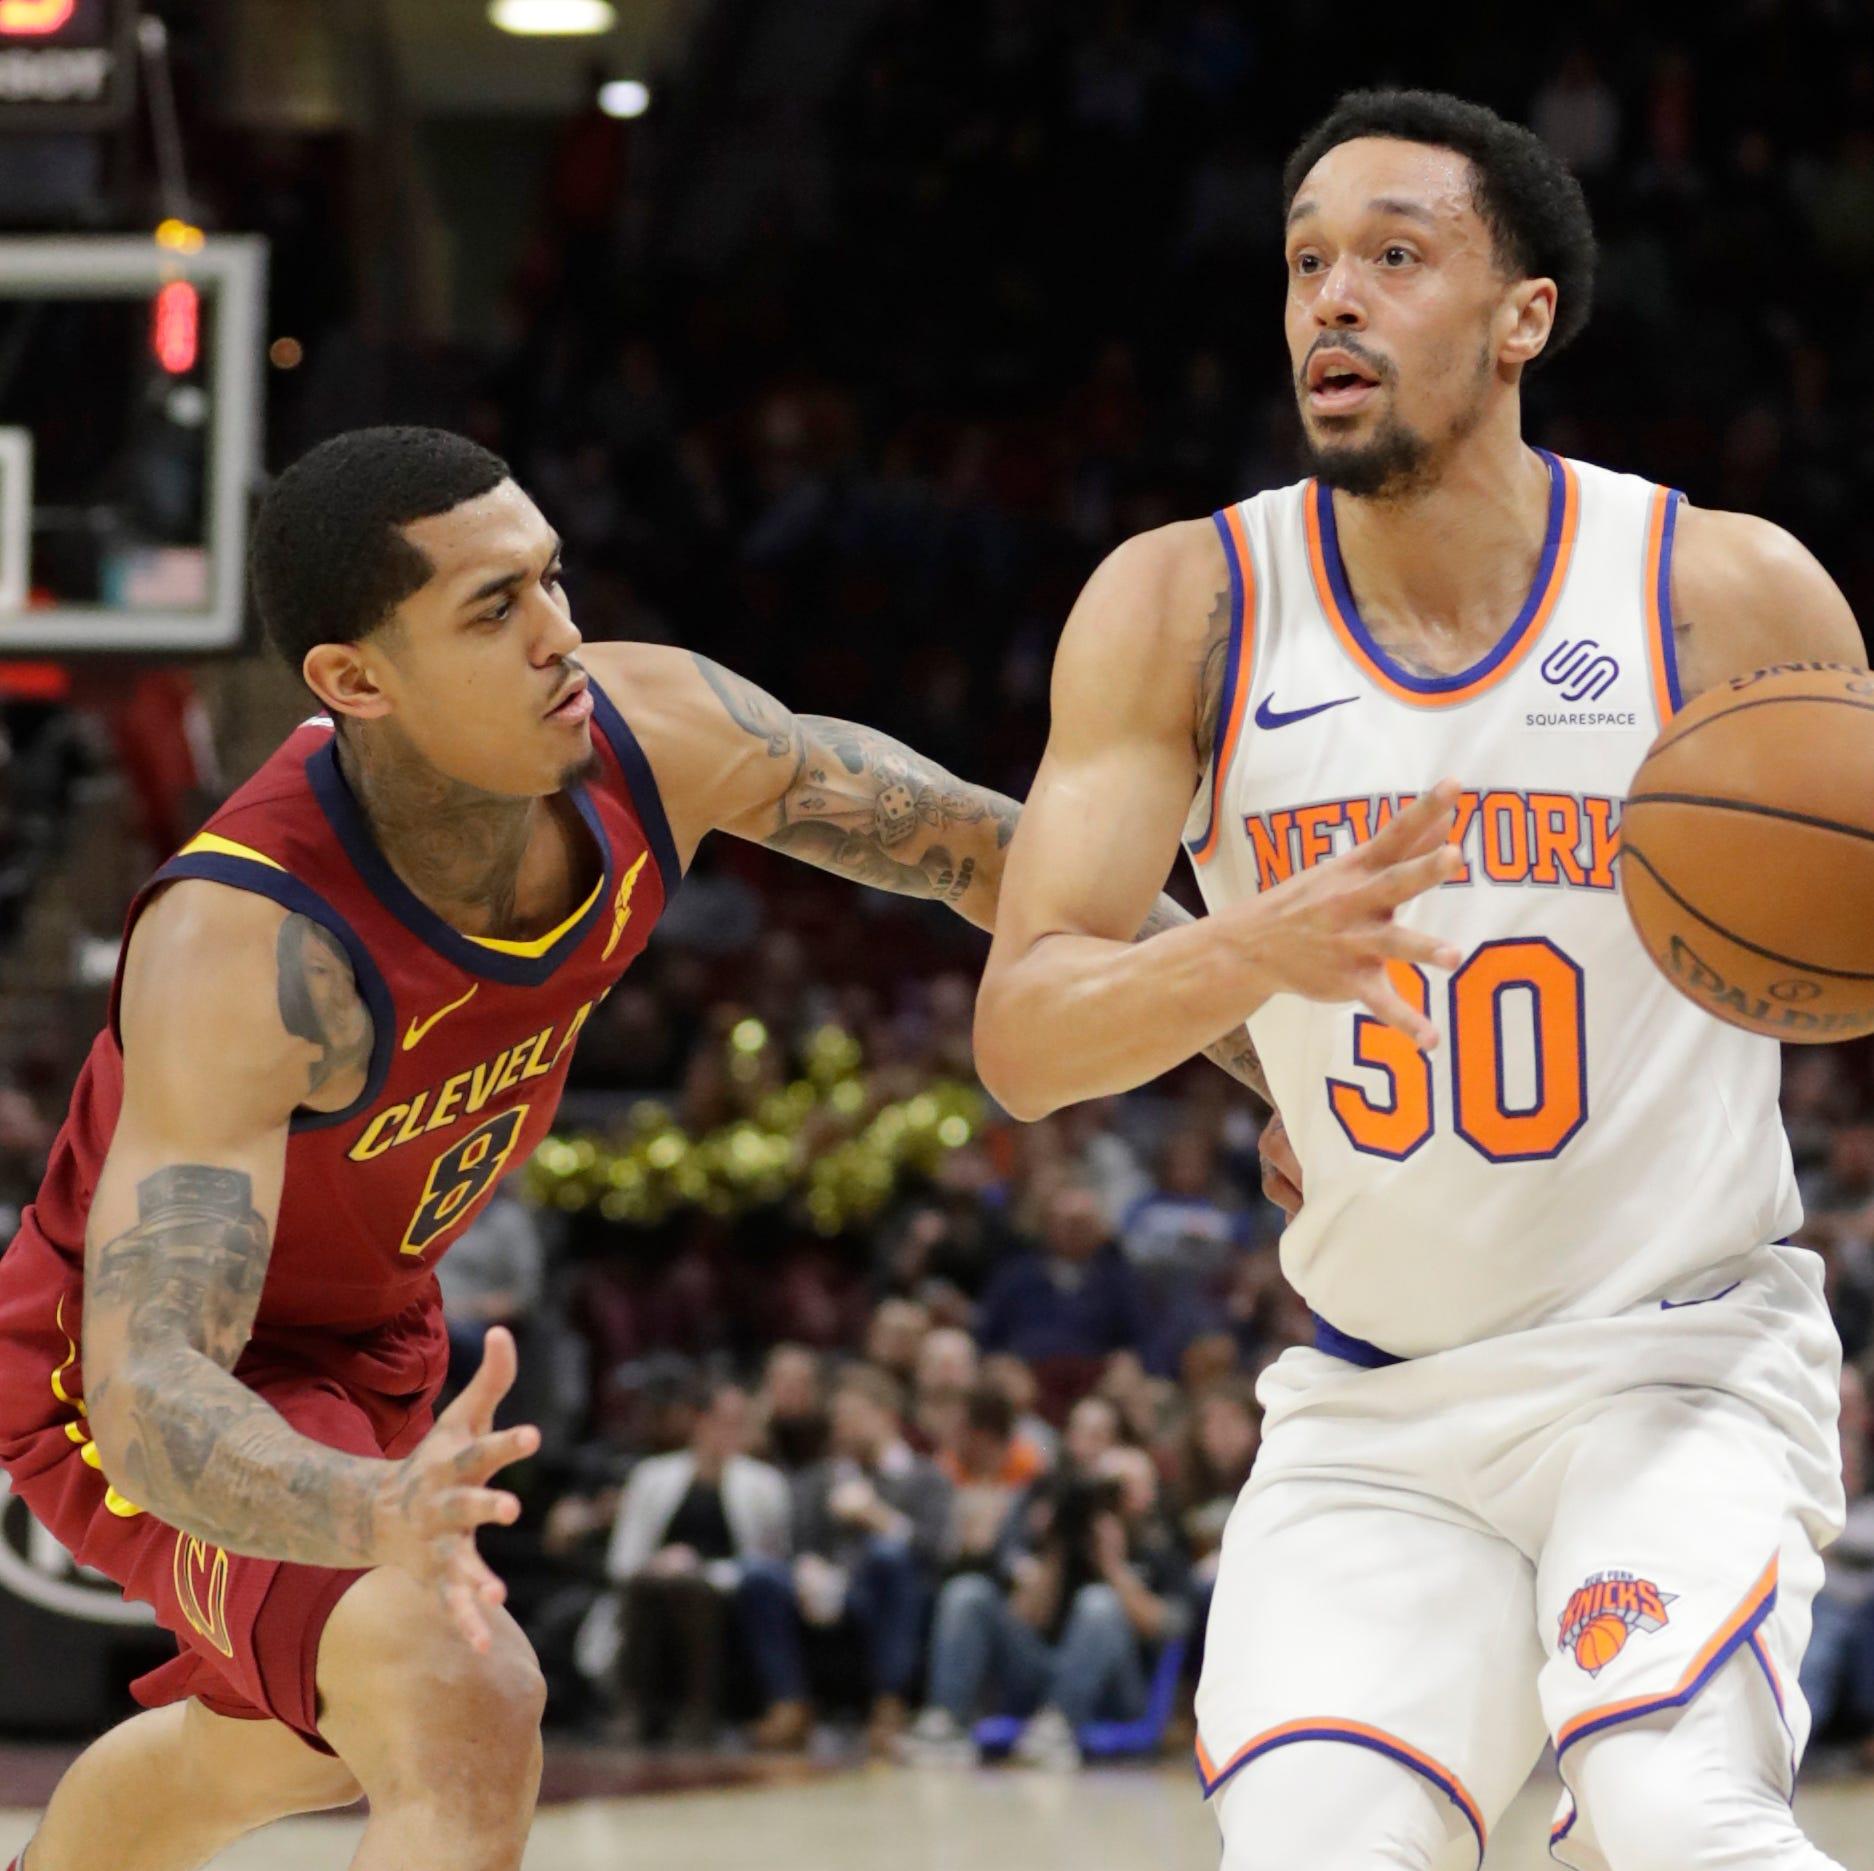 New York Knicks sign former Vanderbilt basketball star John Jenkins to two-year deal